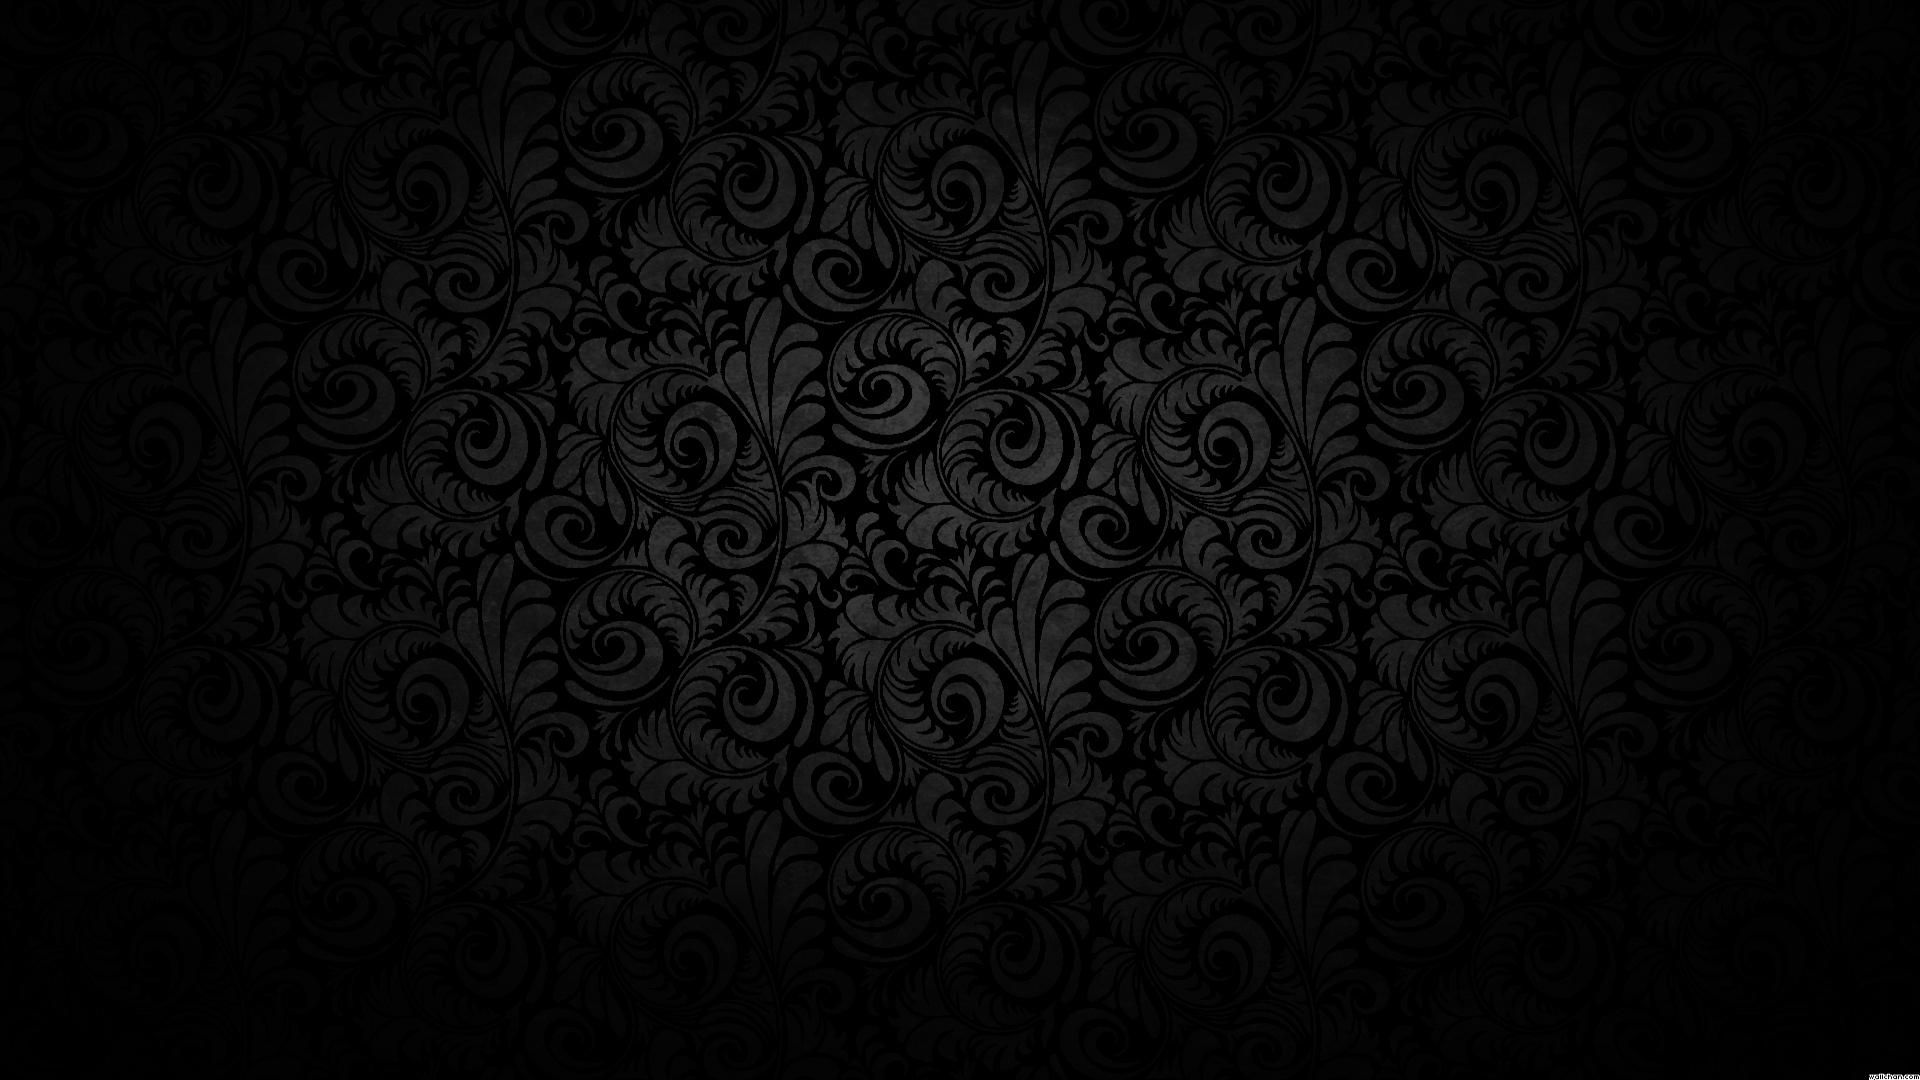 Black Wallpaper 618329 Dark Black Wallpaper Black Background Wallpaper Black Hd Wallpaper